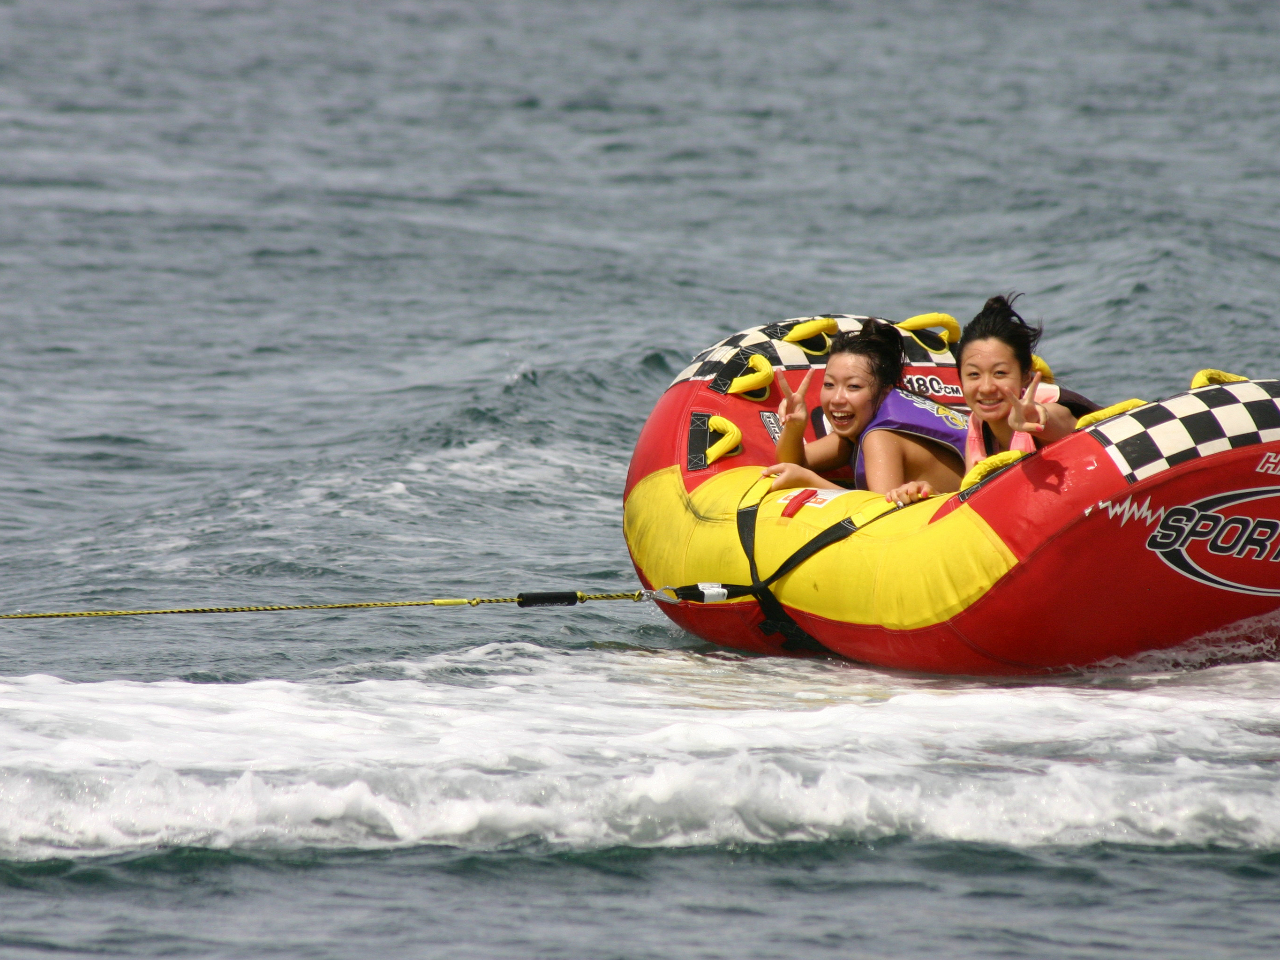 【BBQ+バナナボート+ハーフパイプ+海の家利用プラン】◆富士山が見える海水浴場...